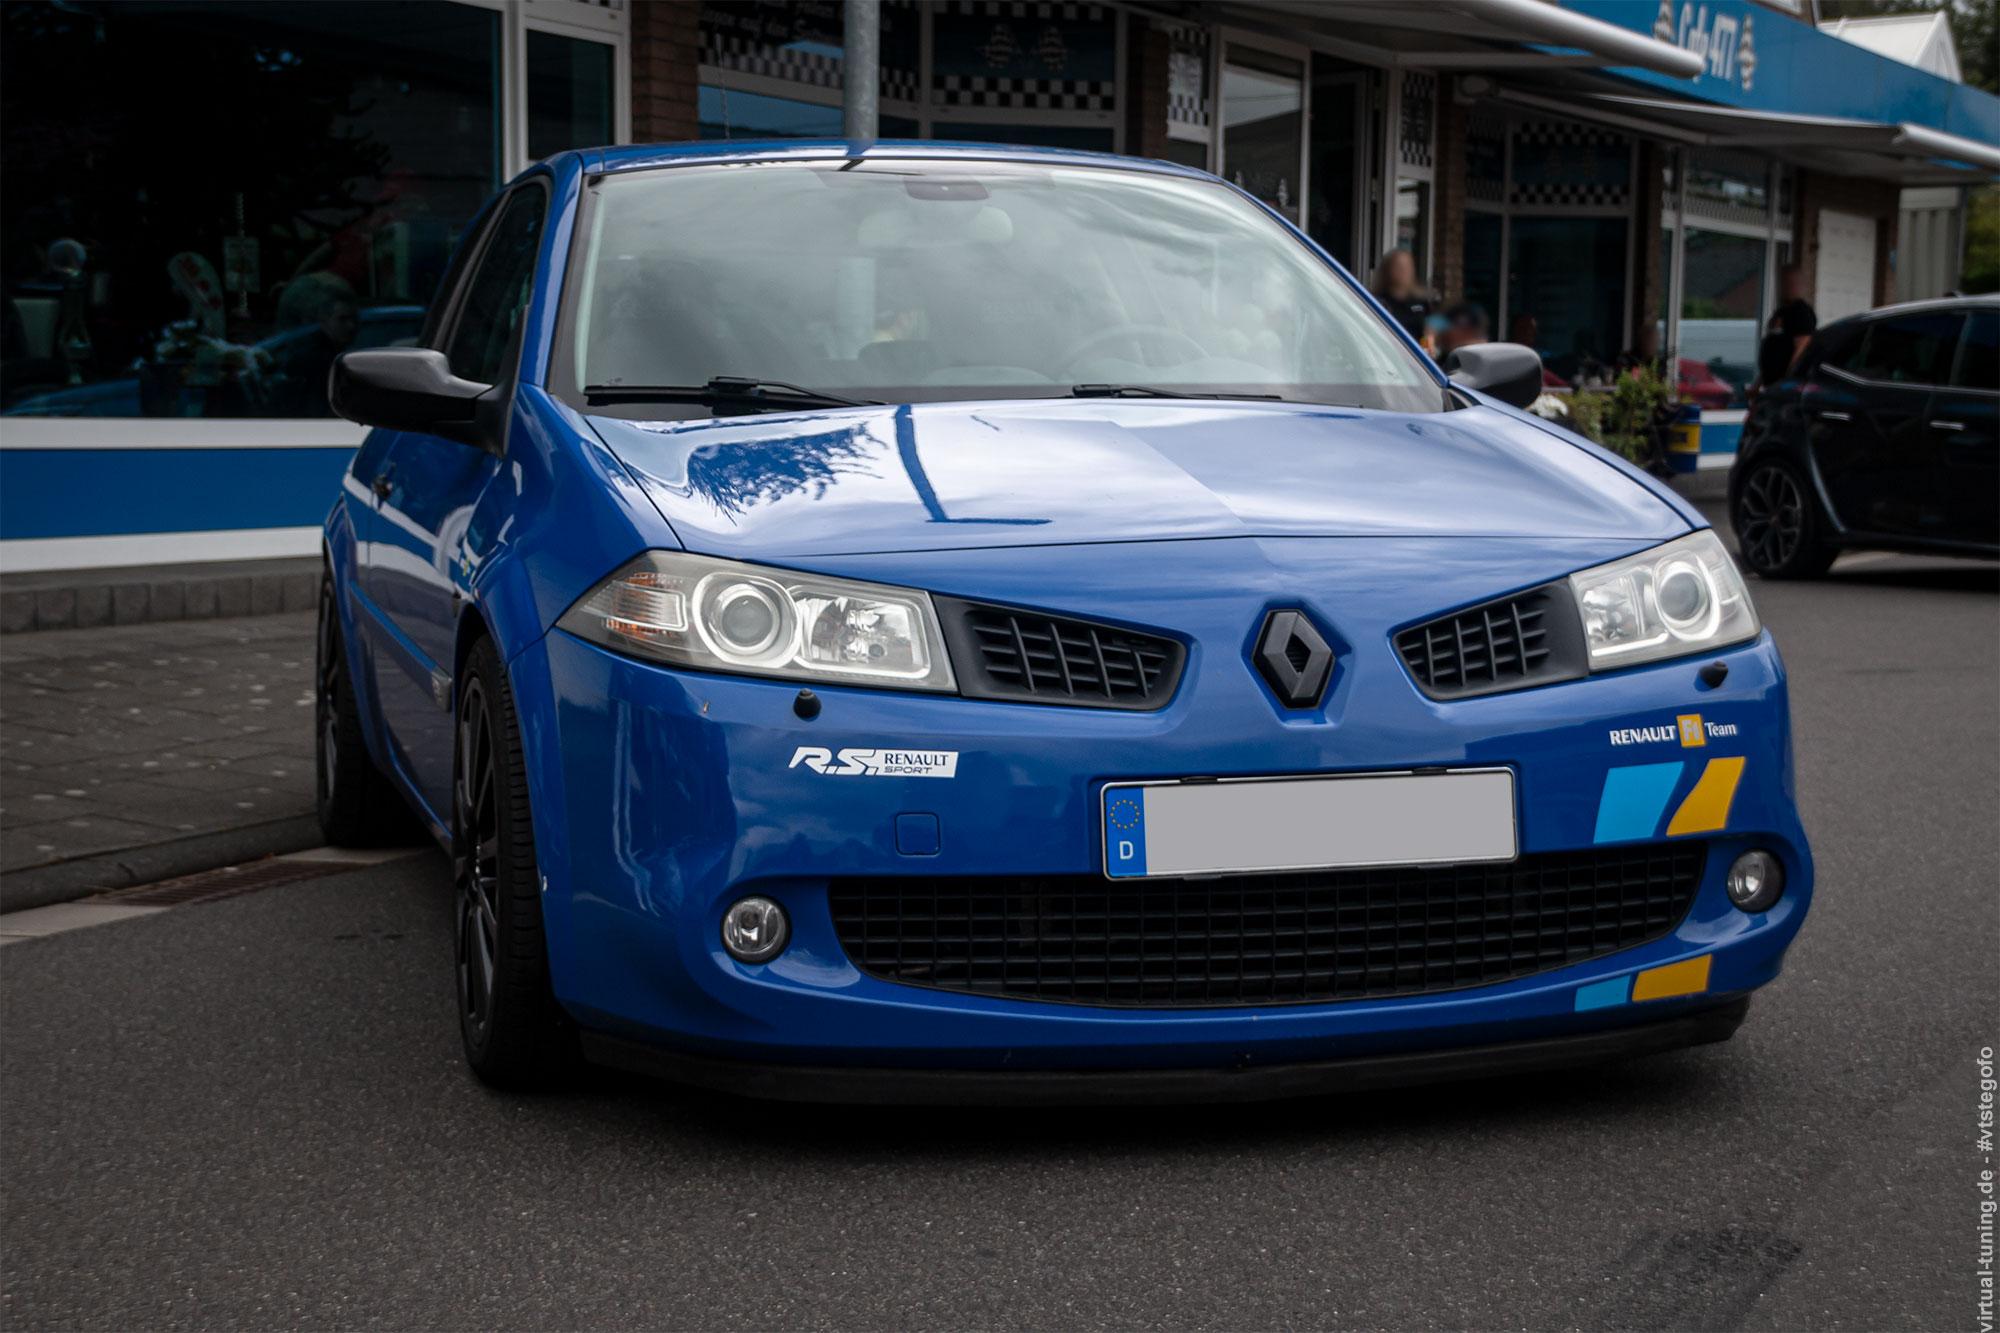 Renault Megane 2 R.S. - R.S. meets Cafe 477